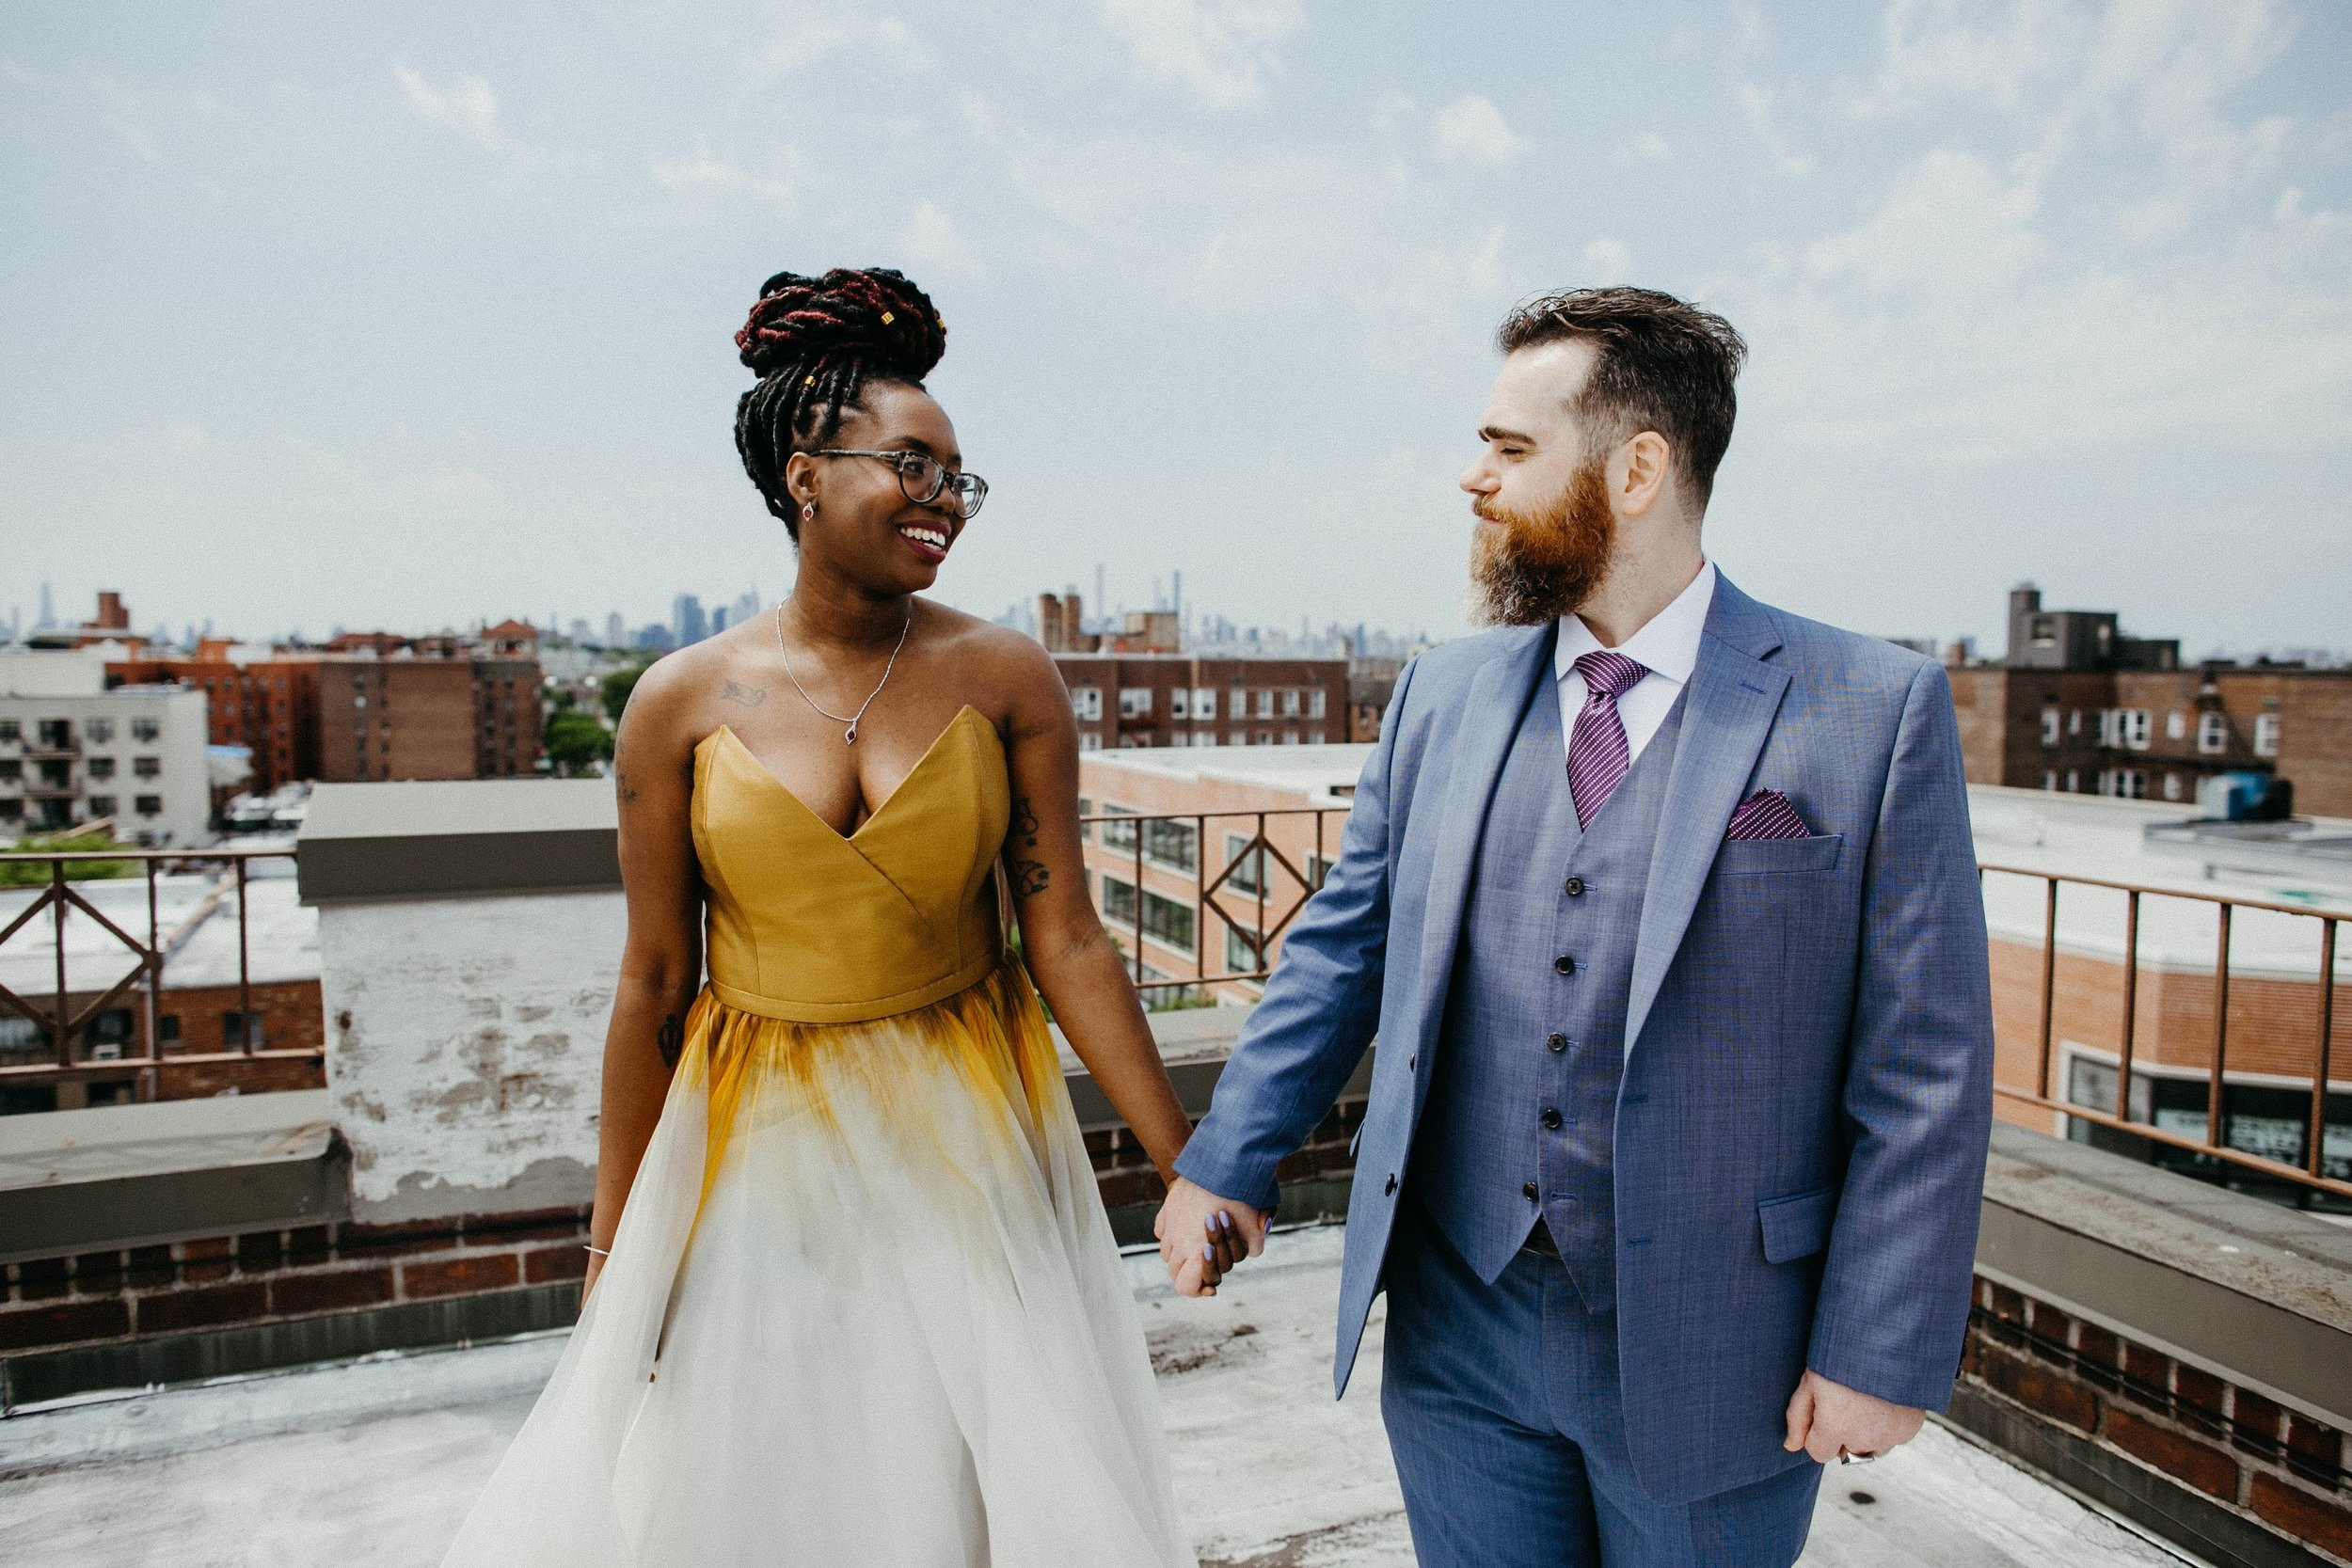 Sevlynn-Photography-Wedding-LIC-Landing-Maiella-NYC-6.jpg